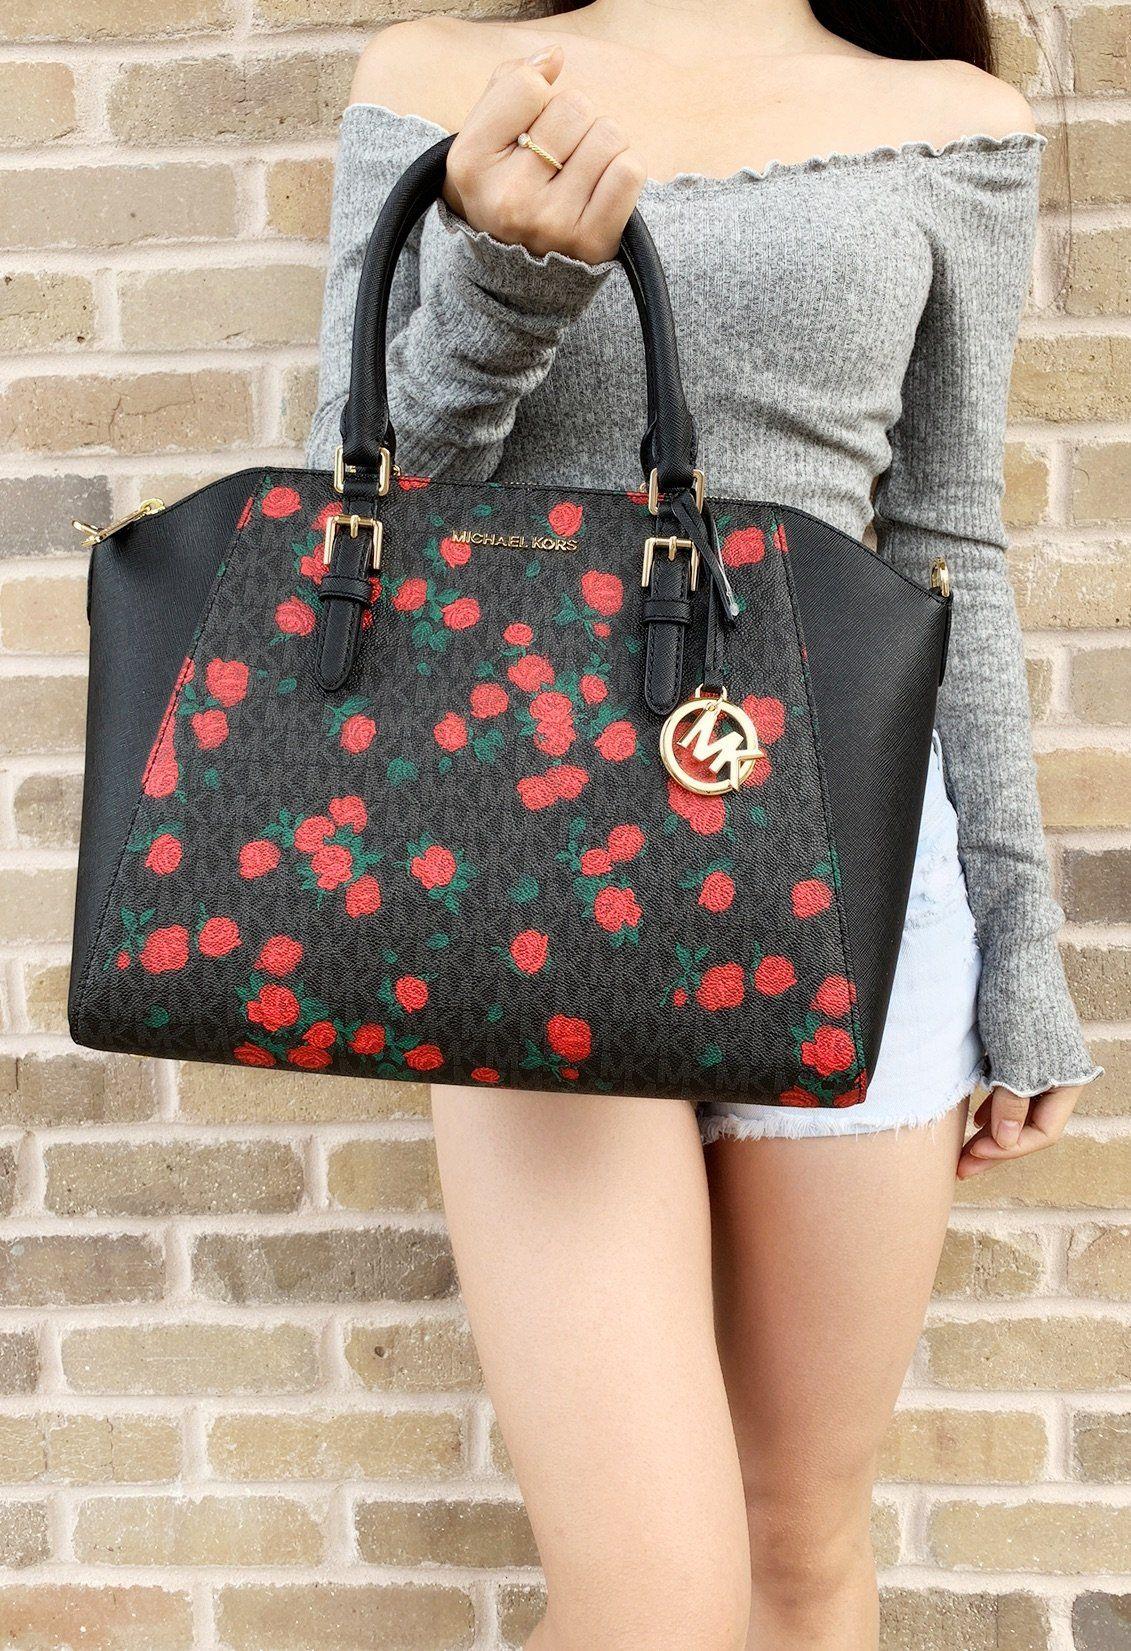 a35eb59d8134 Michael Kors Ciara Saffiano Large Top Zip Satchel Crossbody Black Red Rose  #MK #poshcloset #resellercommunity #ebayresellers #poshmark #tradesyseller  ...